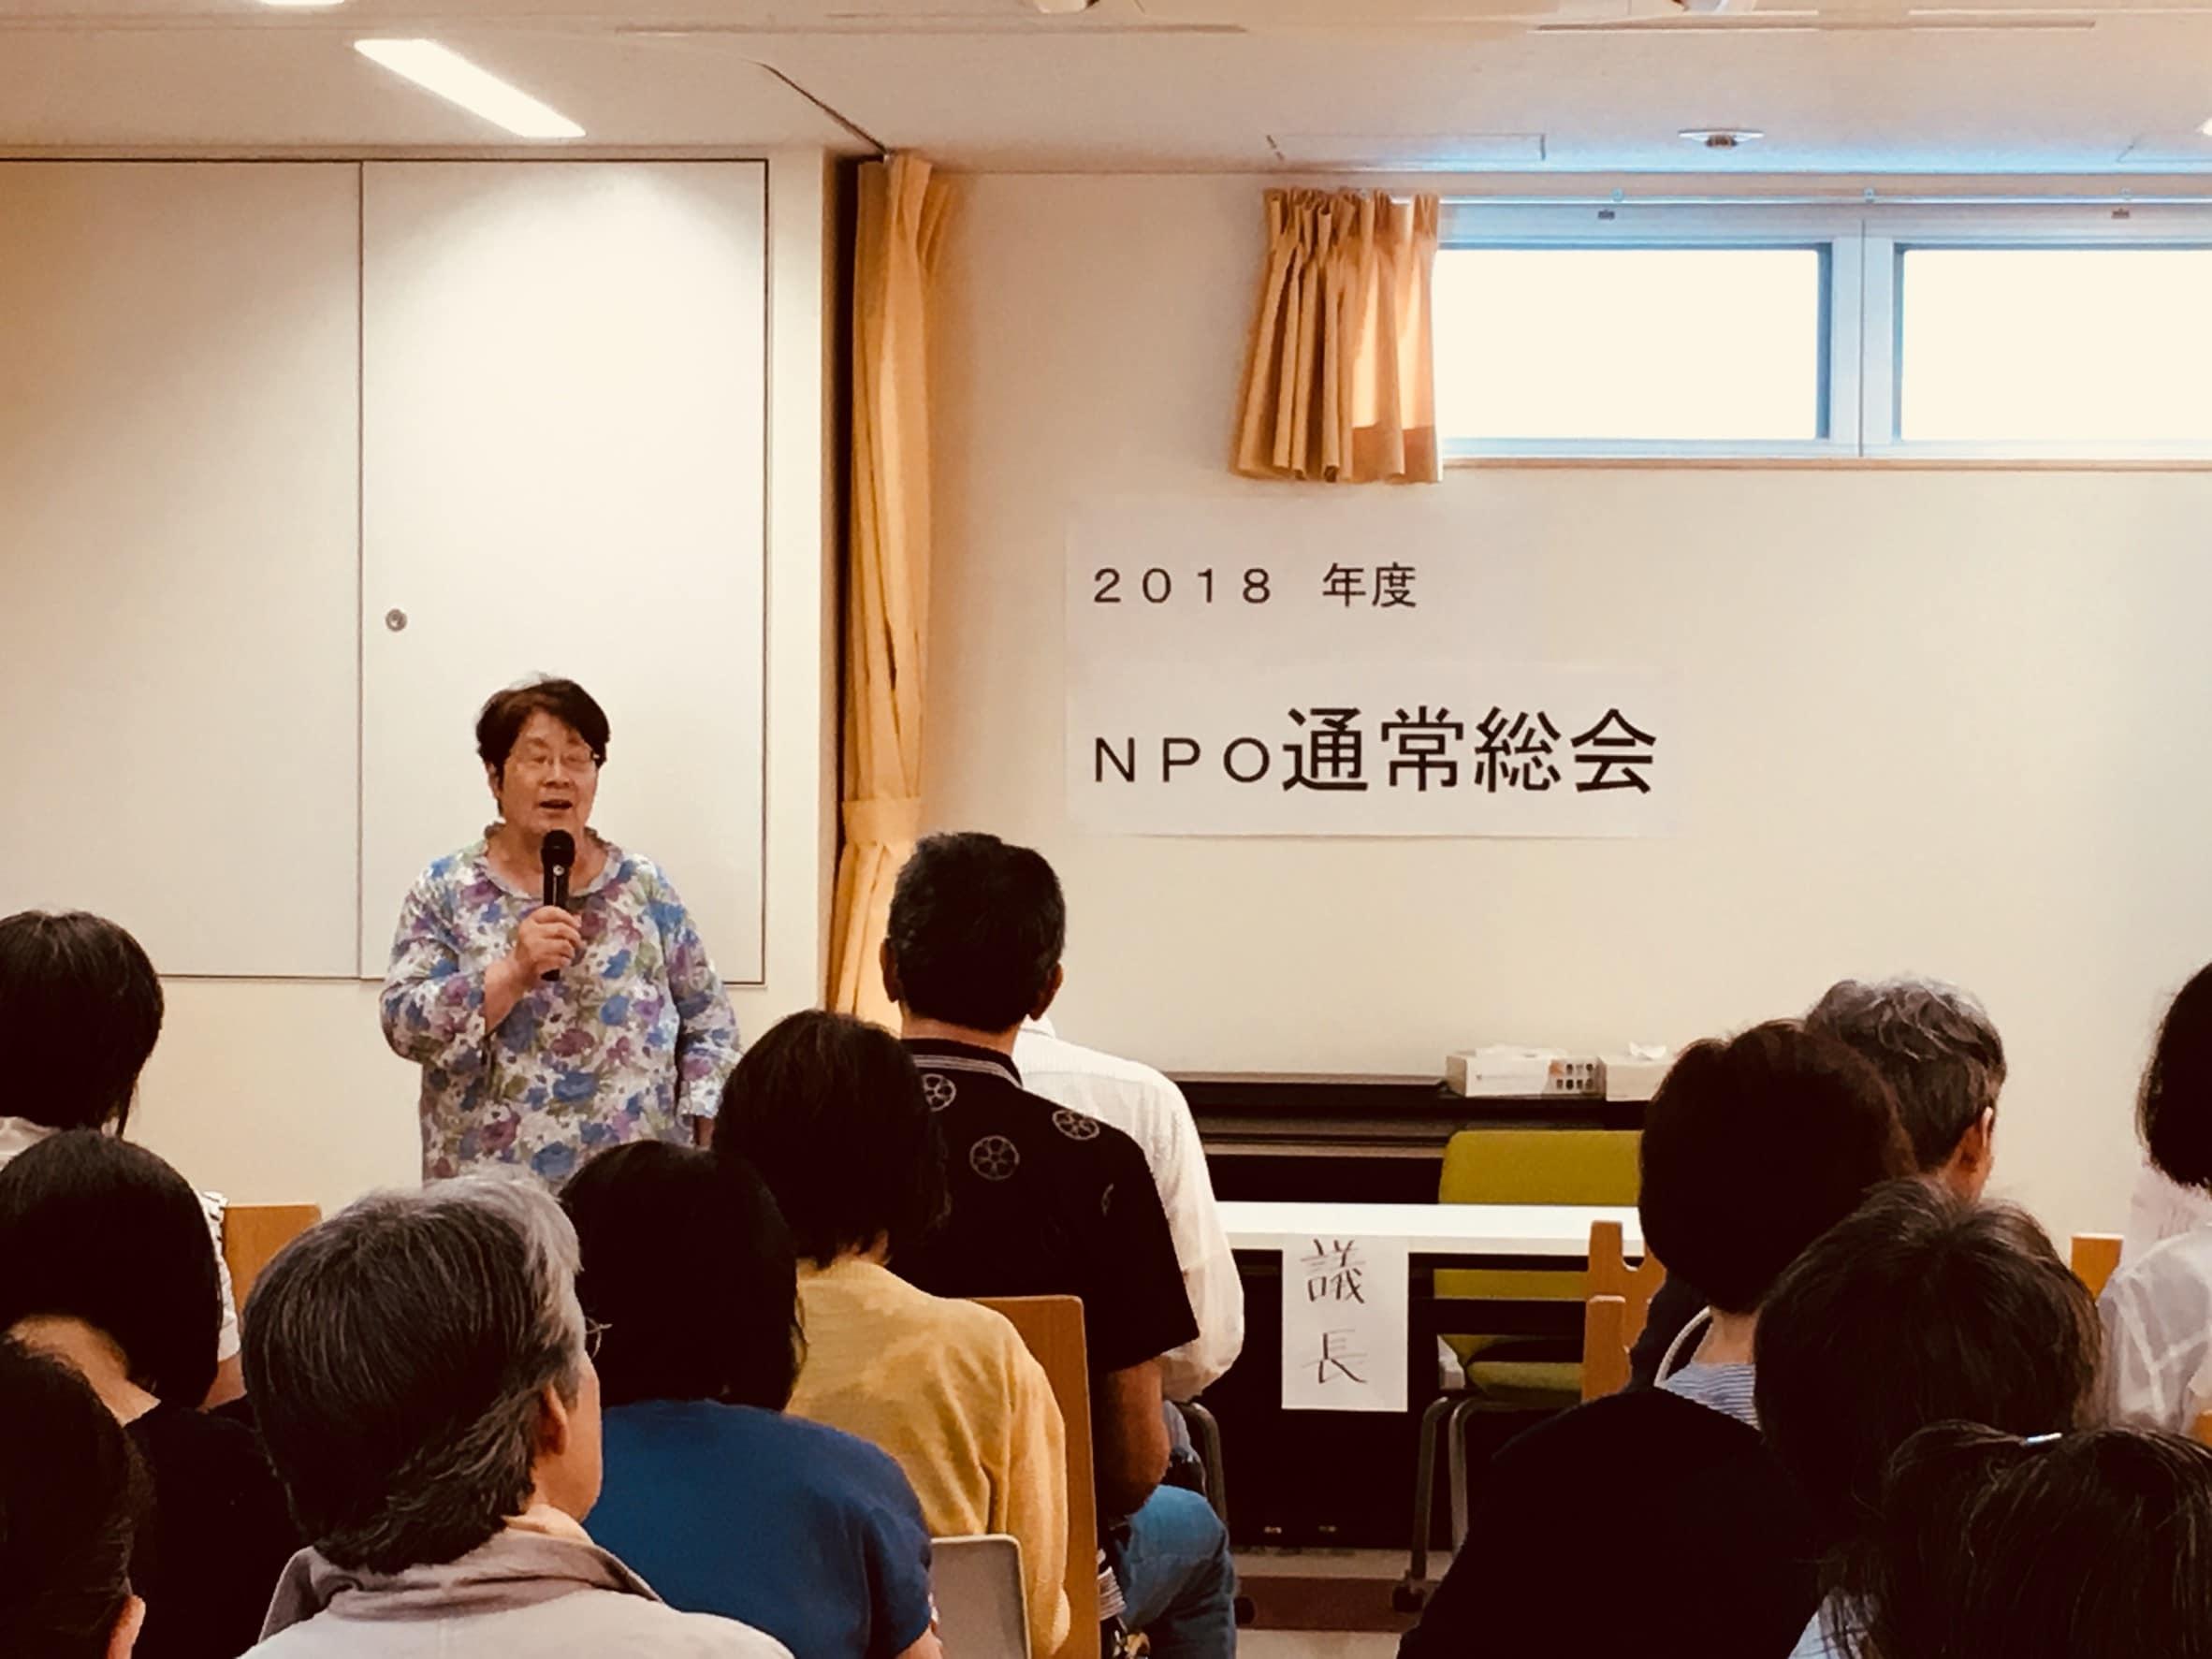 NPO法人概要 – フリースクール東京シューレ